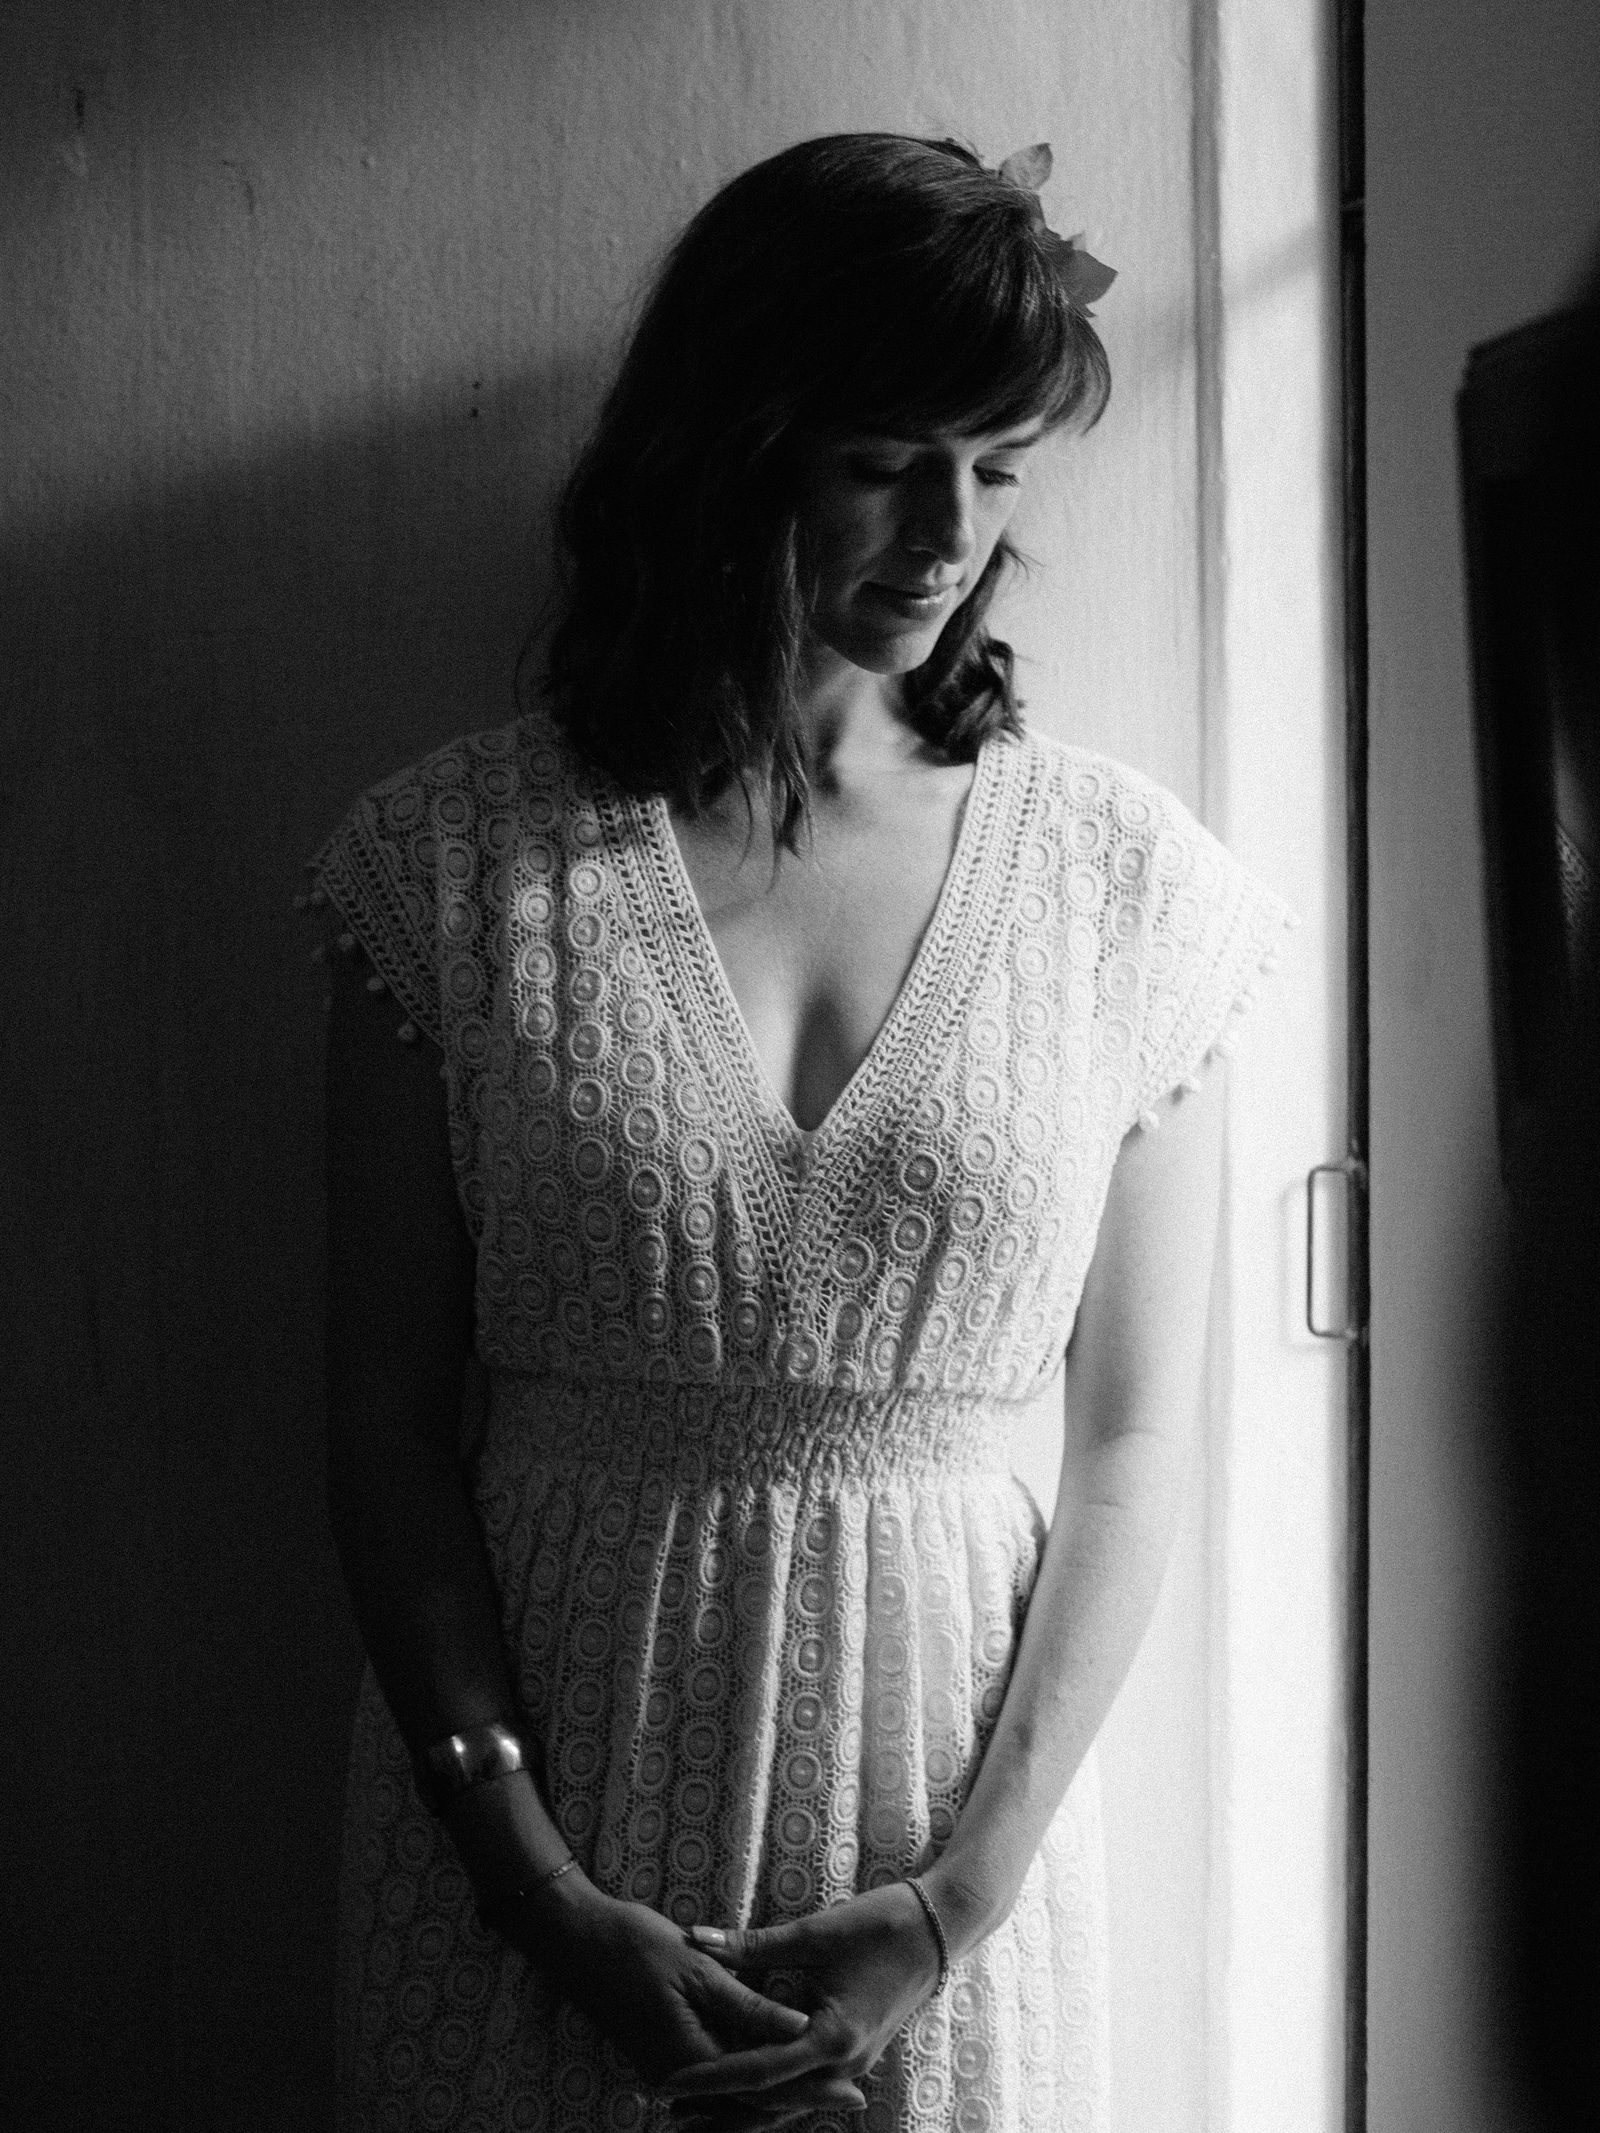 003-intimate-portraits